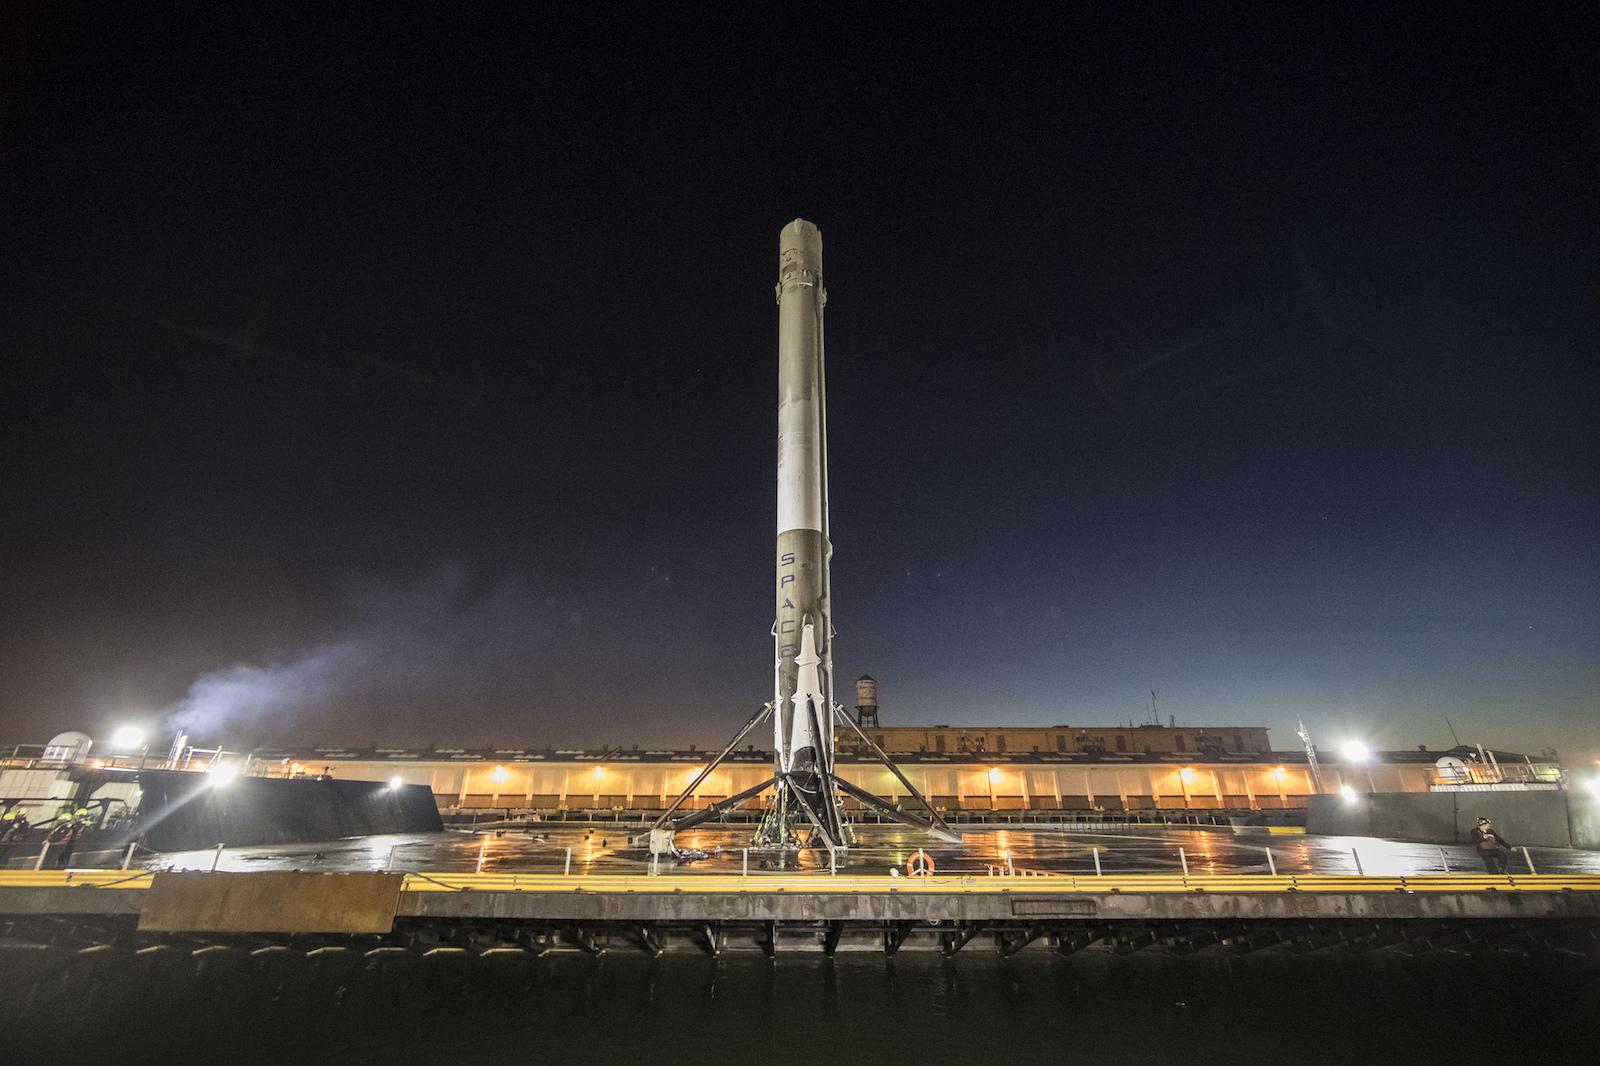 SpaceX-Falcon9-droneship-night